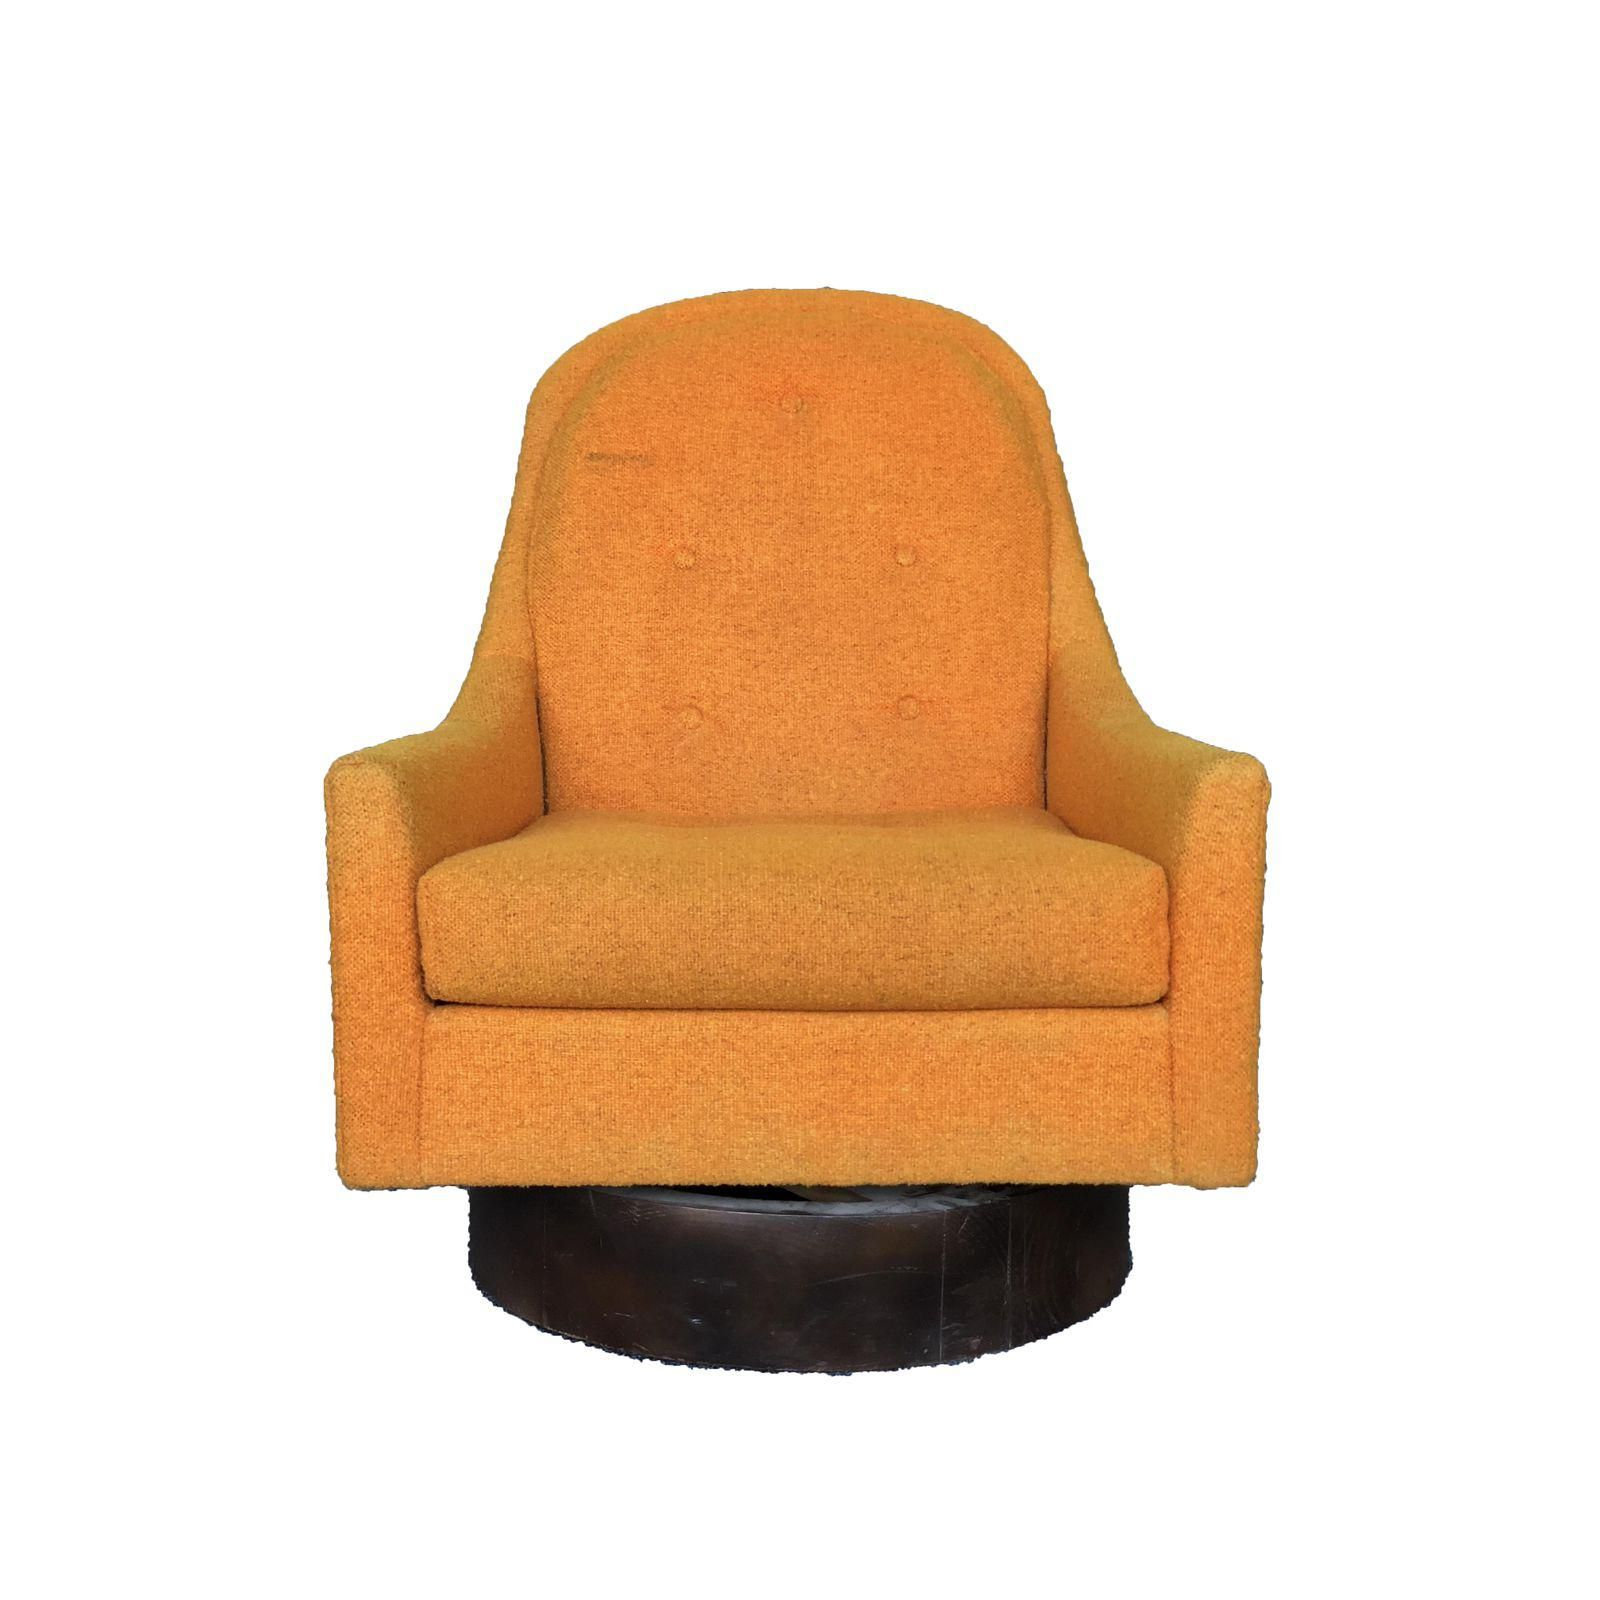 Mid Century Yellow Floating Lounge Chair: Mid-Century Modern Milo Baughman Style Floating Orange